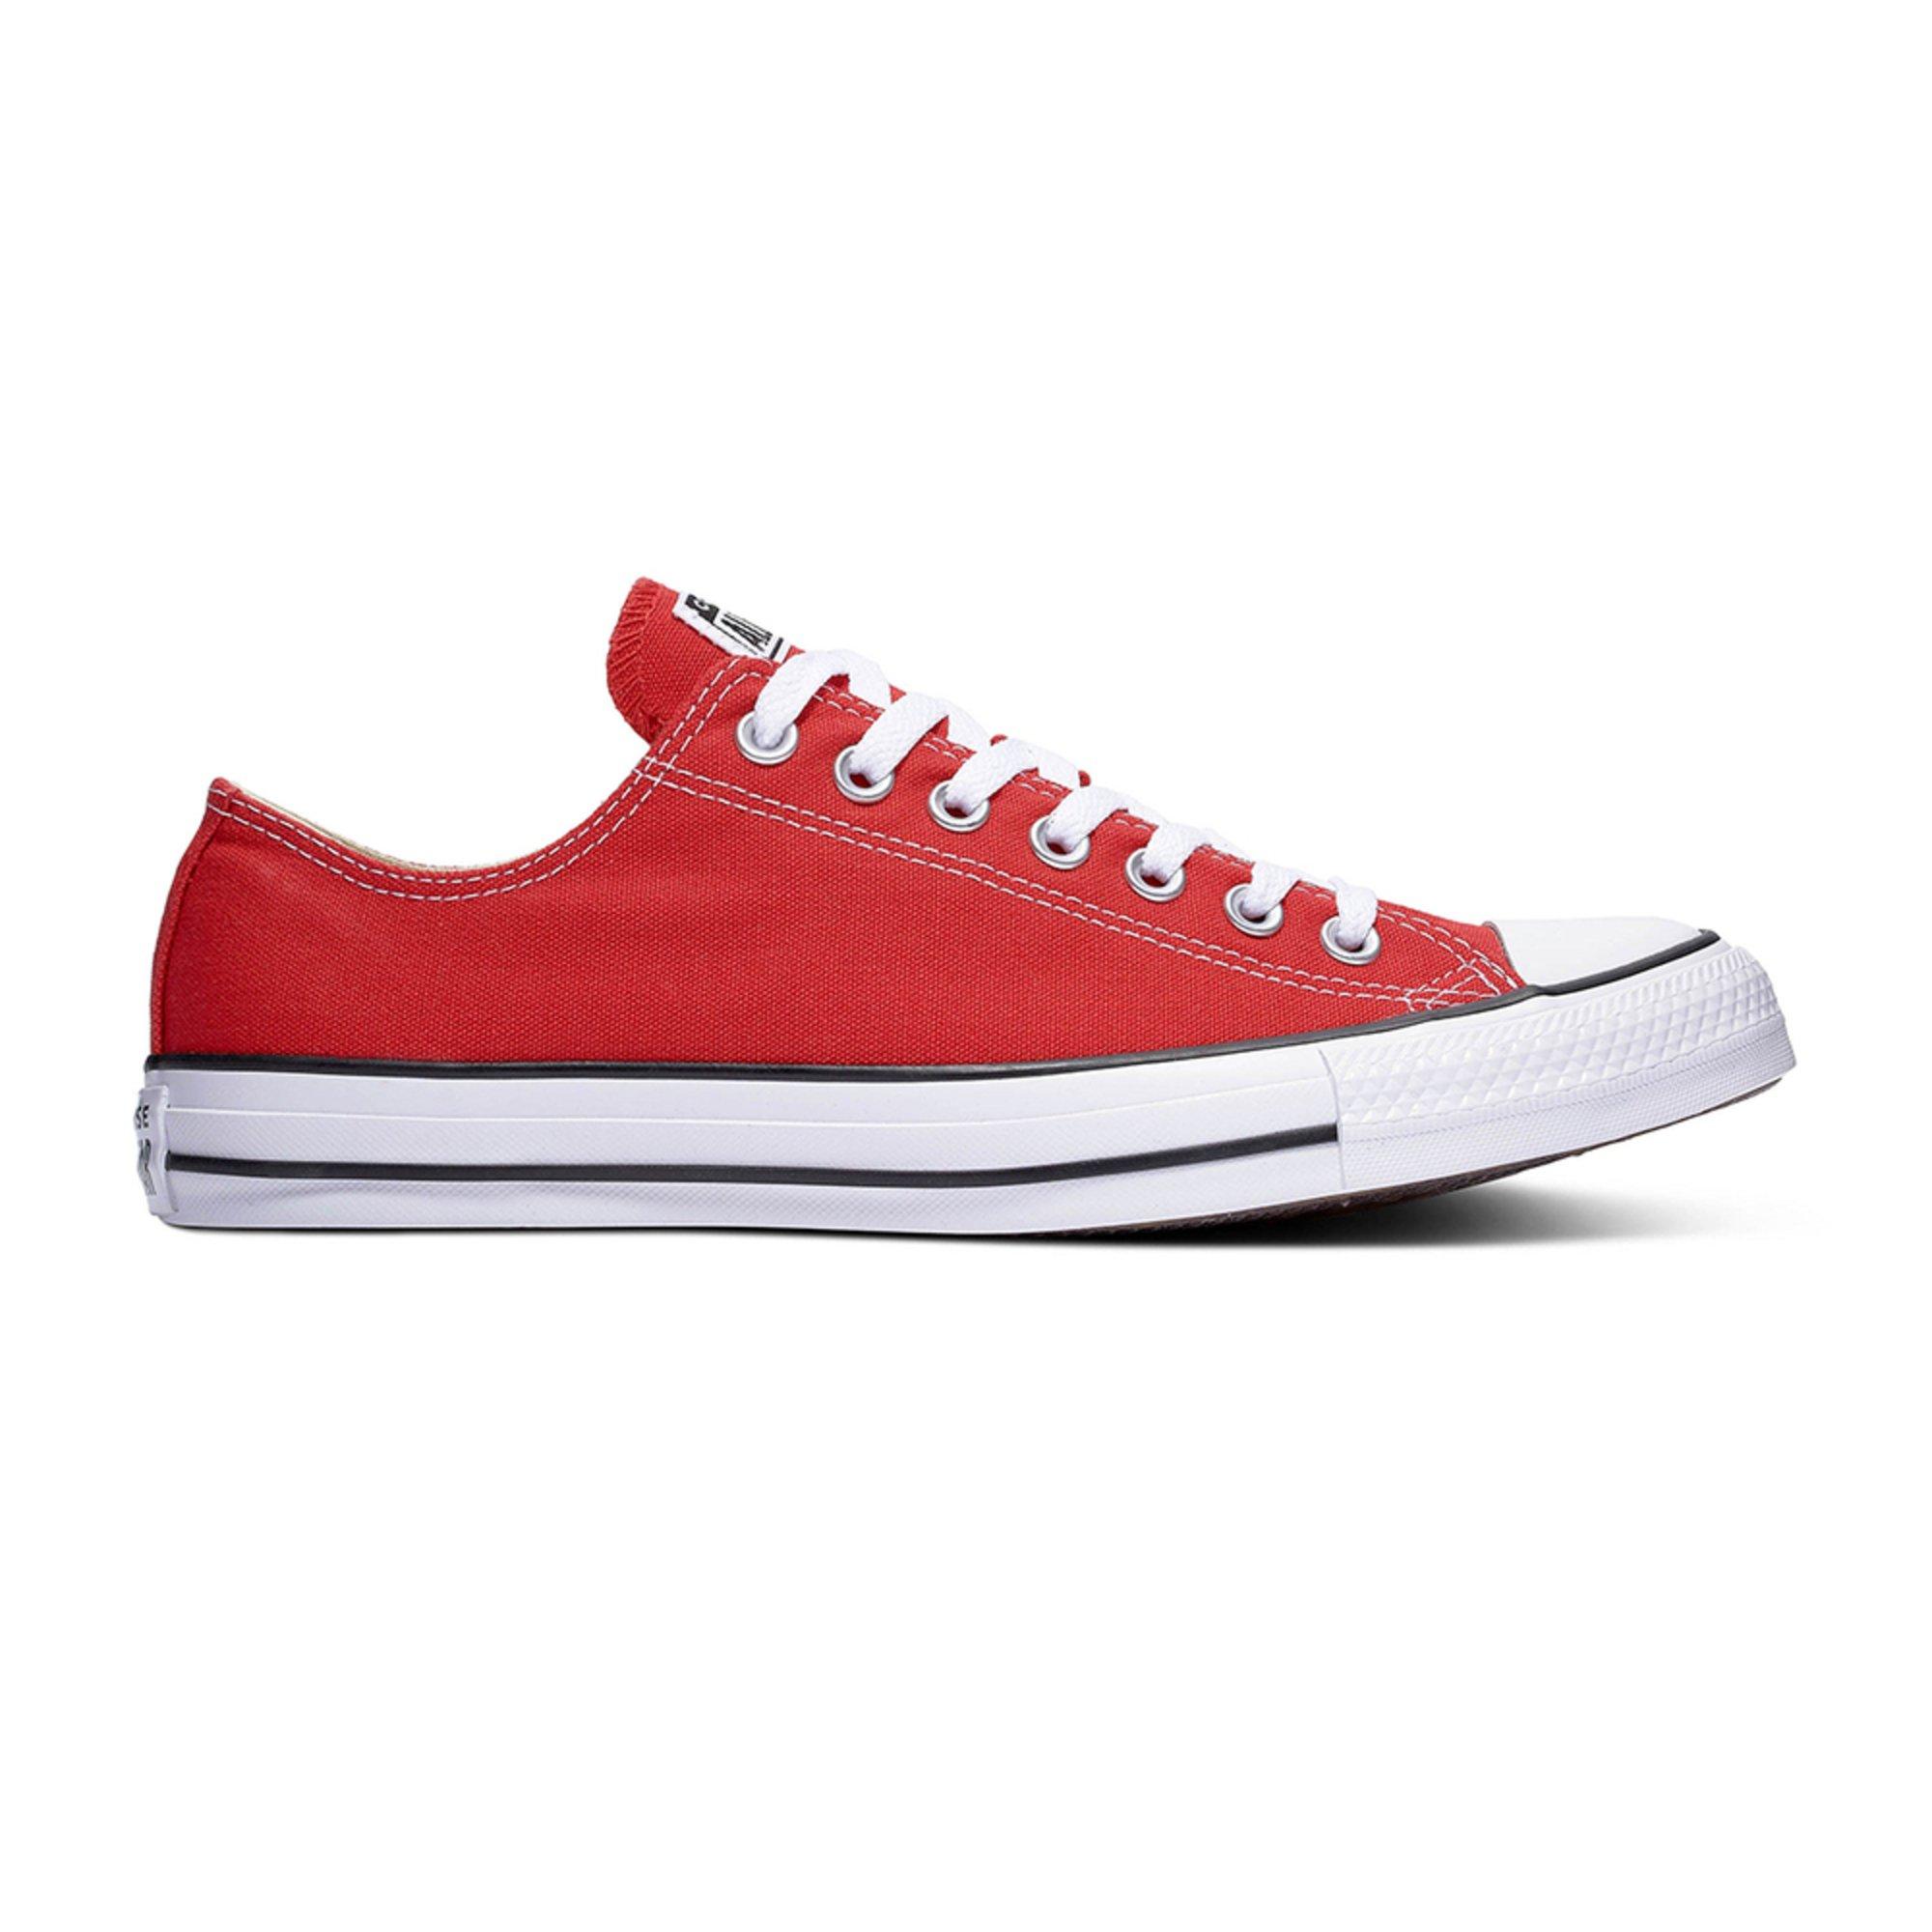 7352525e8969 Converse Men s Chuck Taylor All Star Oxford Low Top Basketball Shoe ...